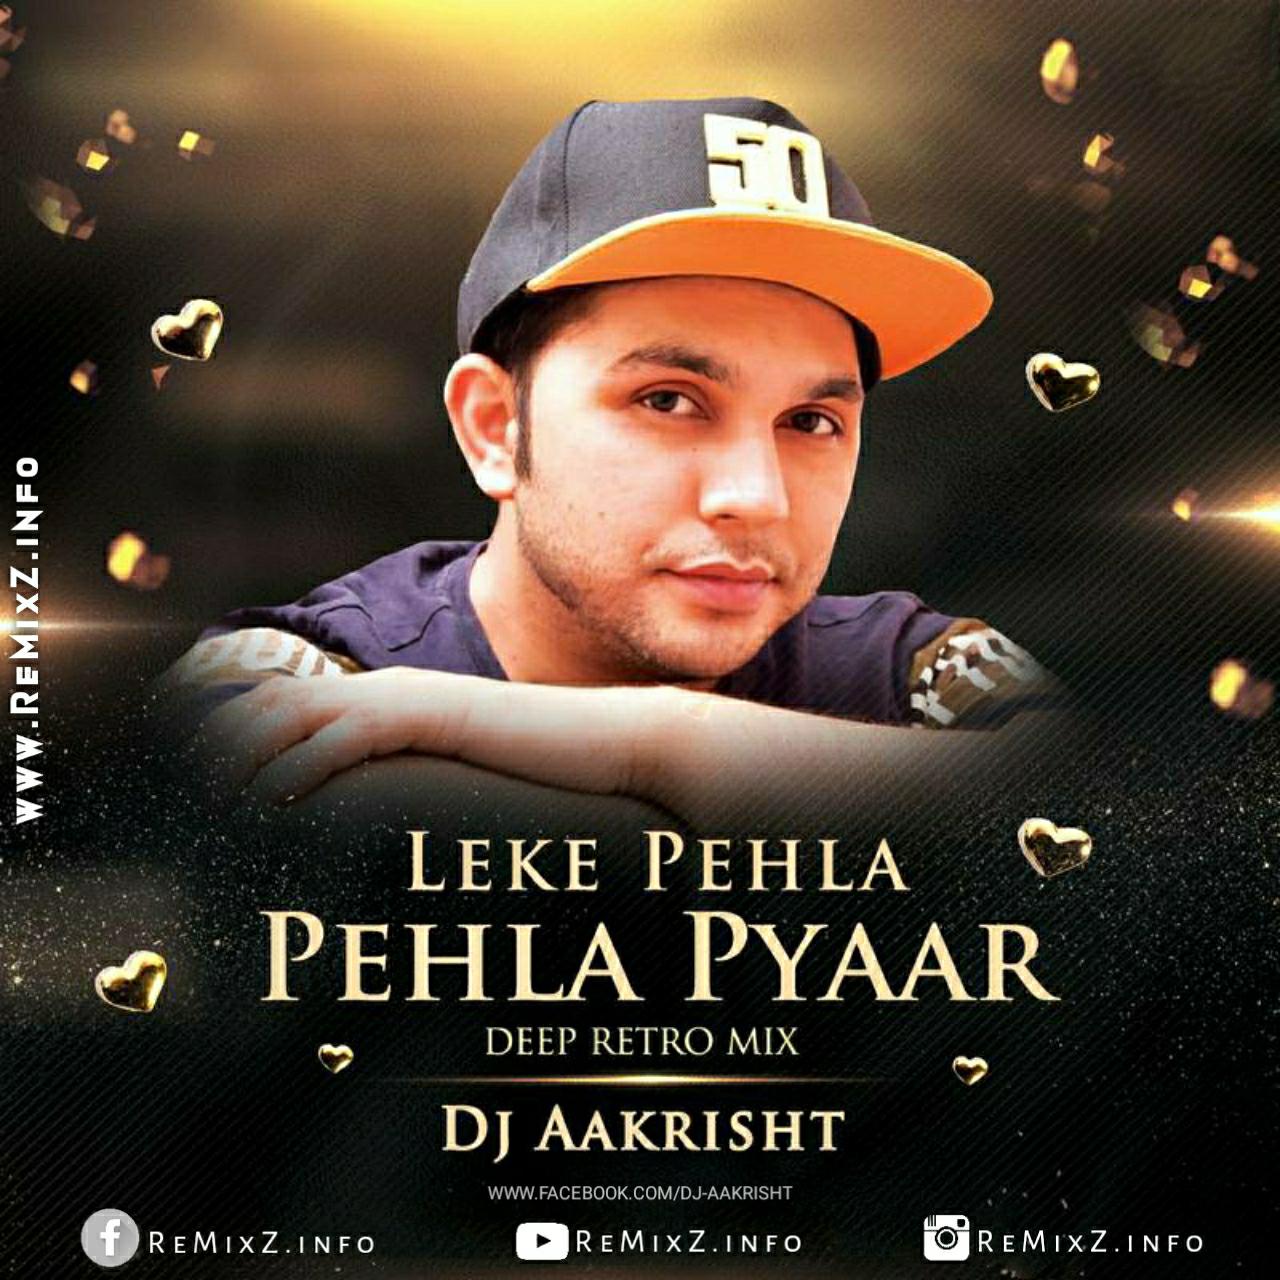 leke-pehla-pehla-pyaar-deep-retro-mix.jpg